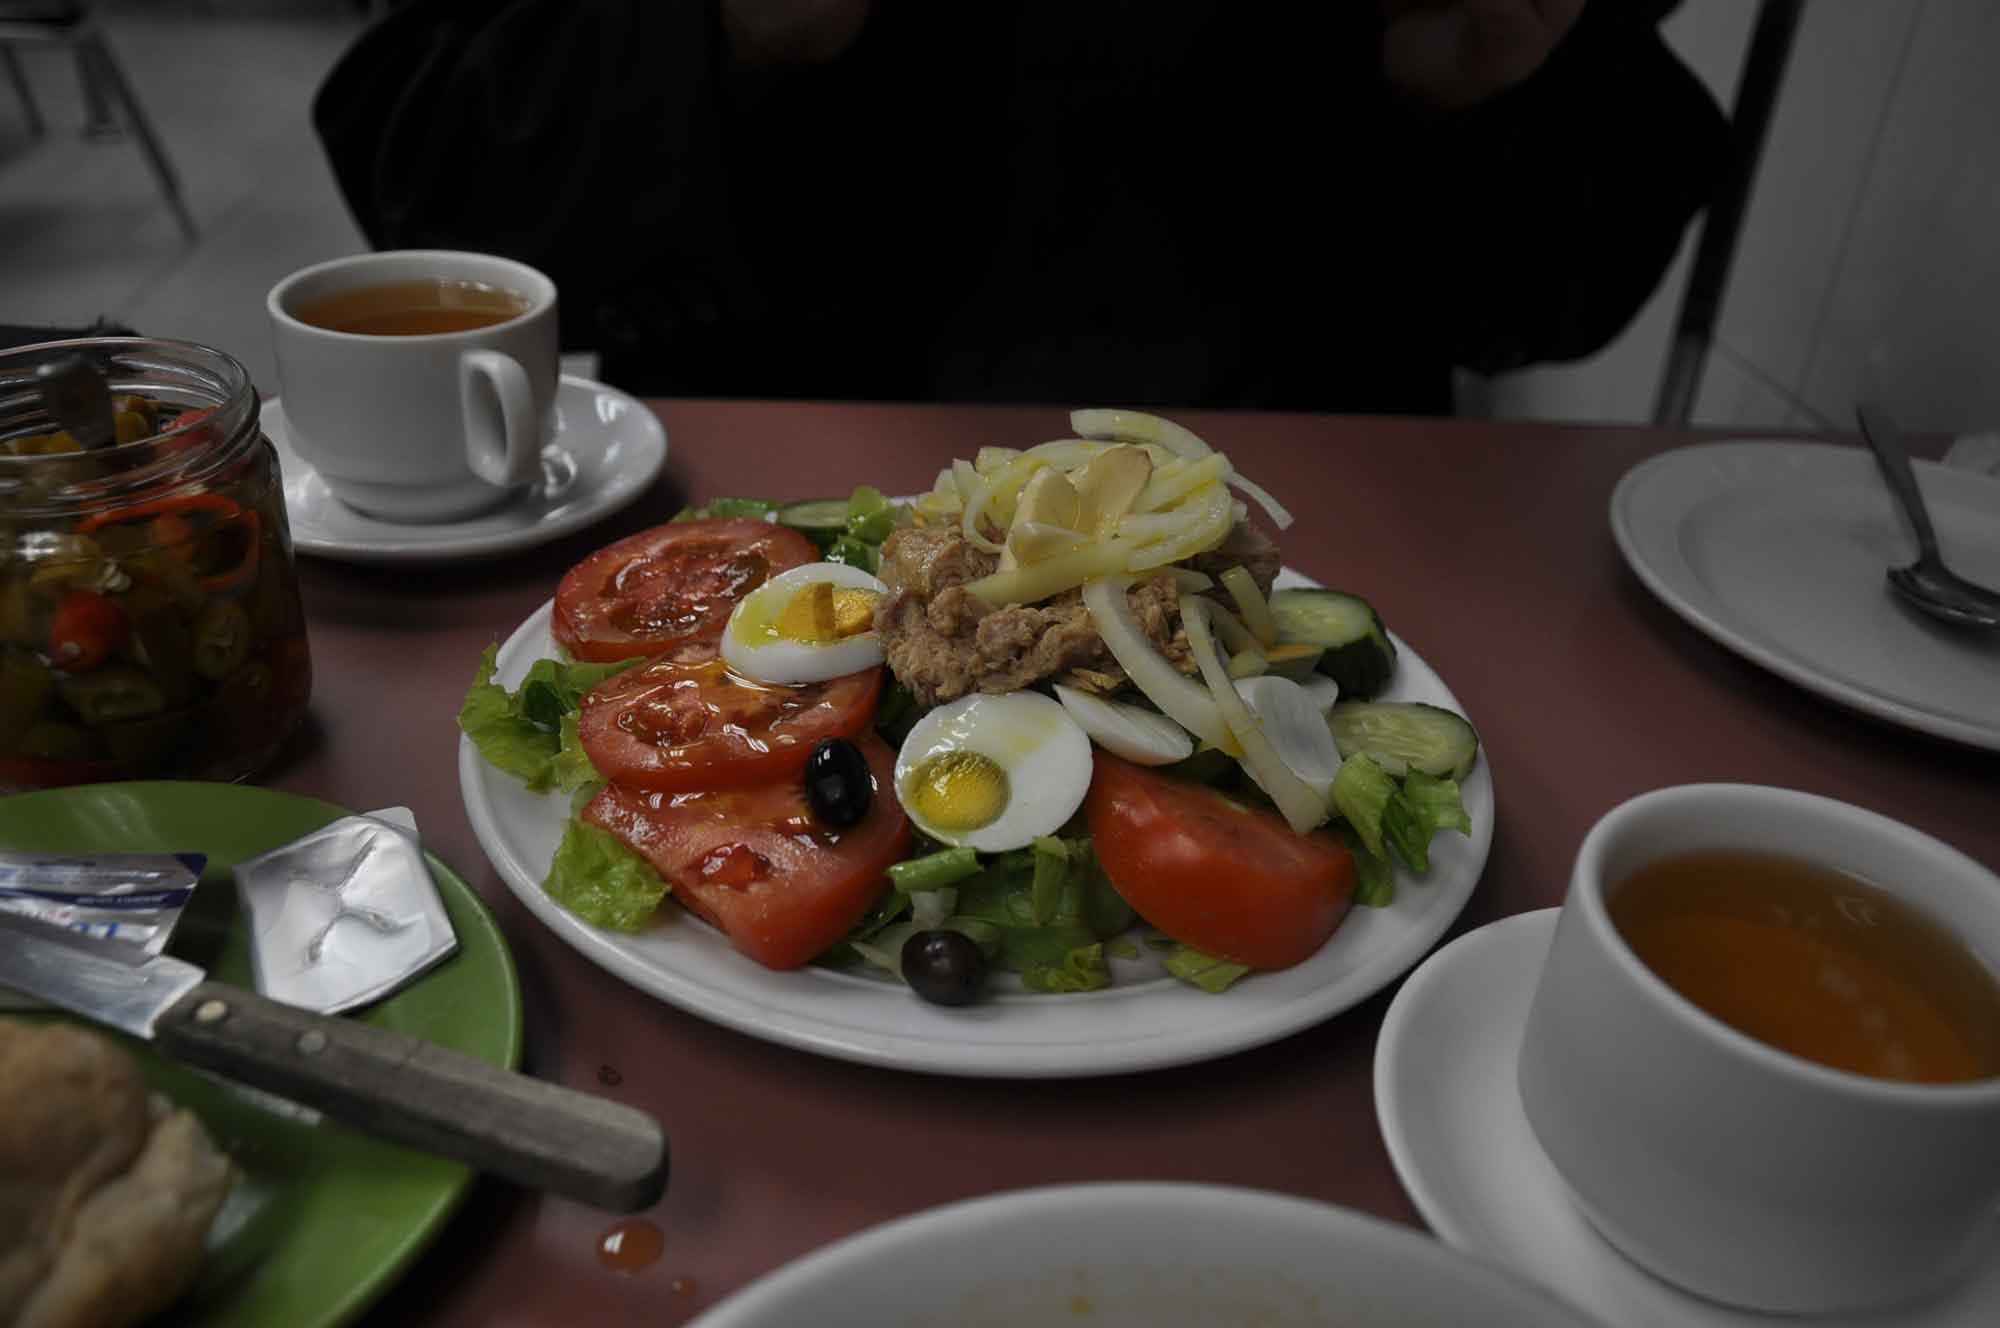 A Vencedora salad